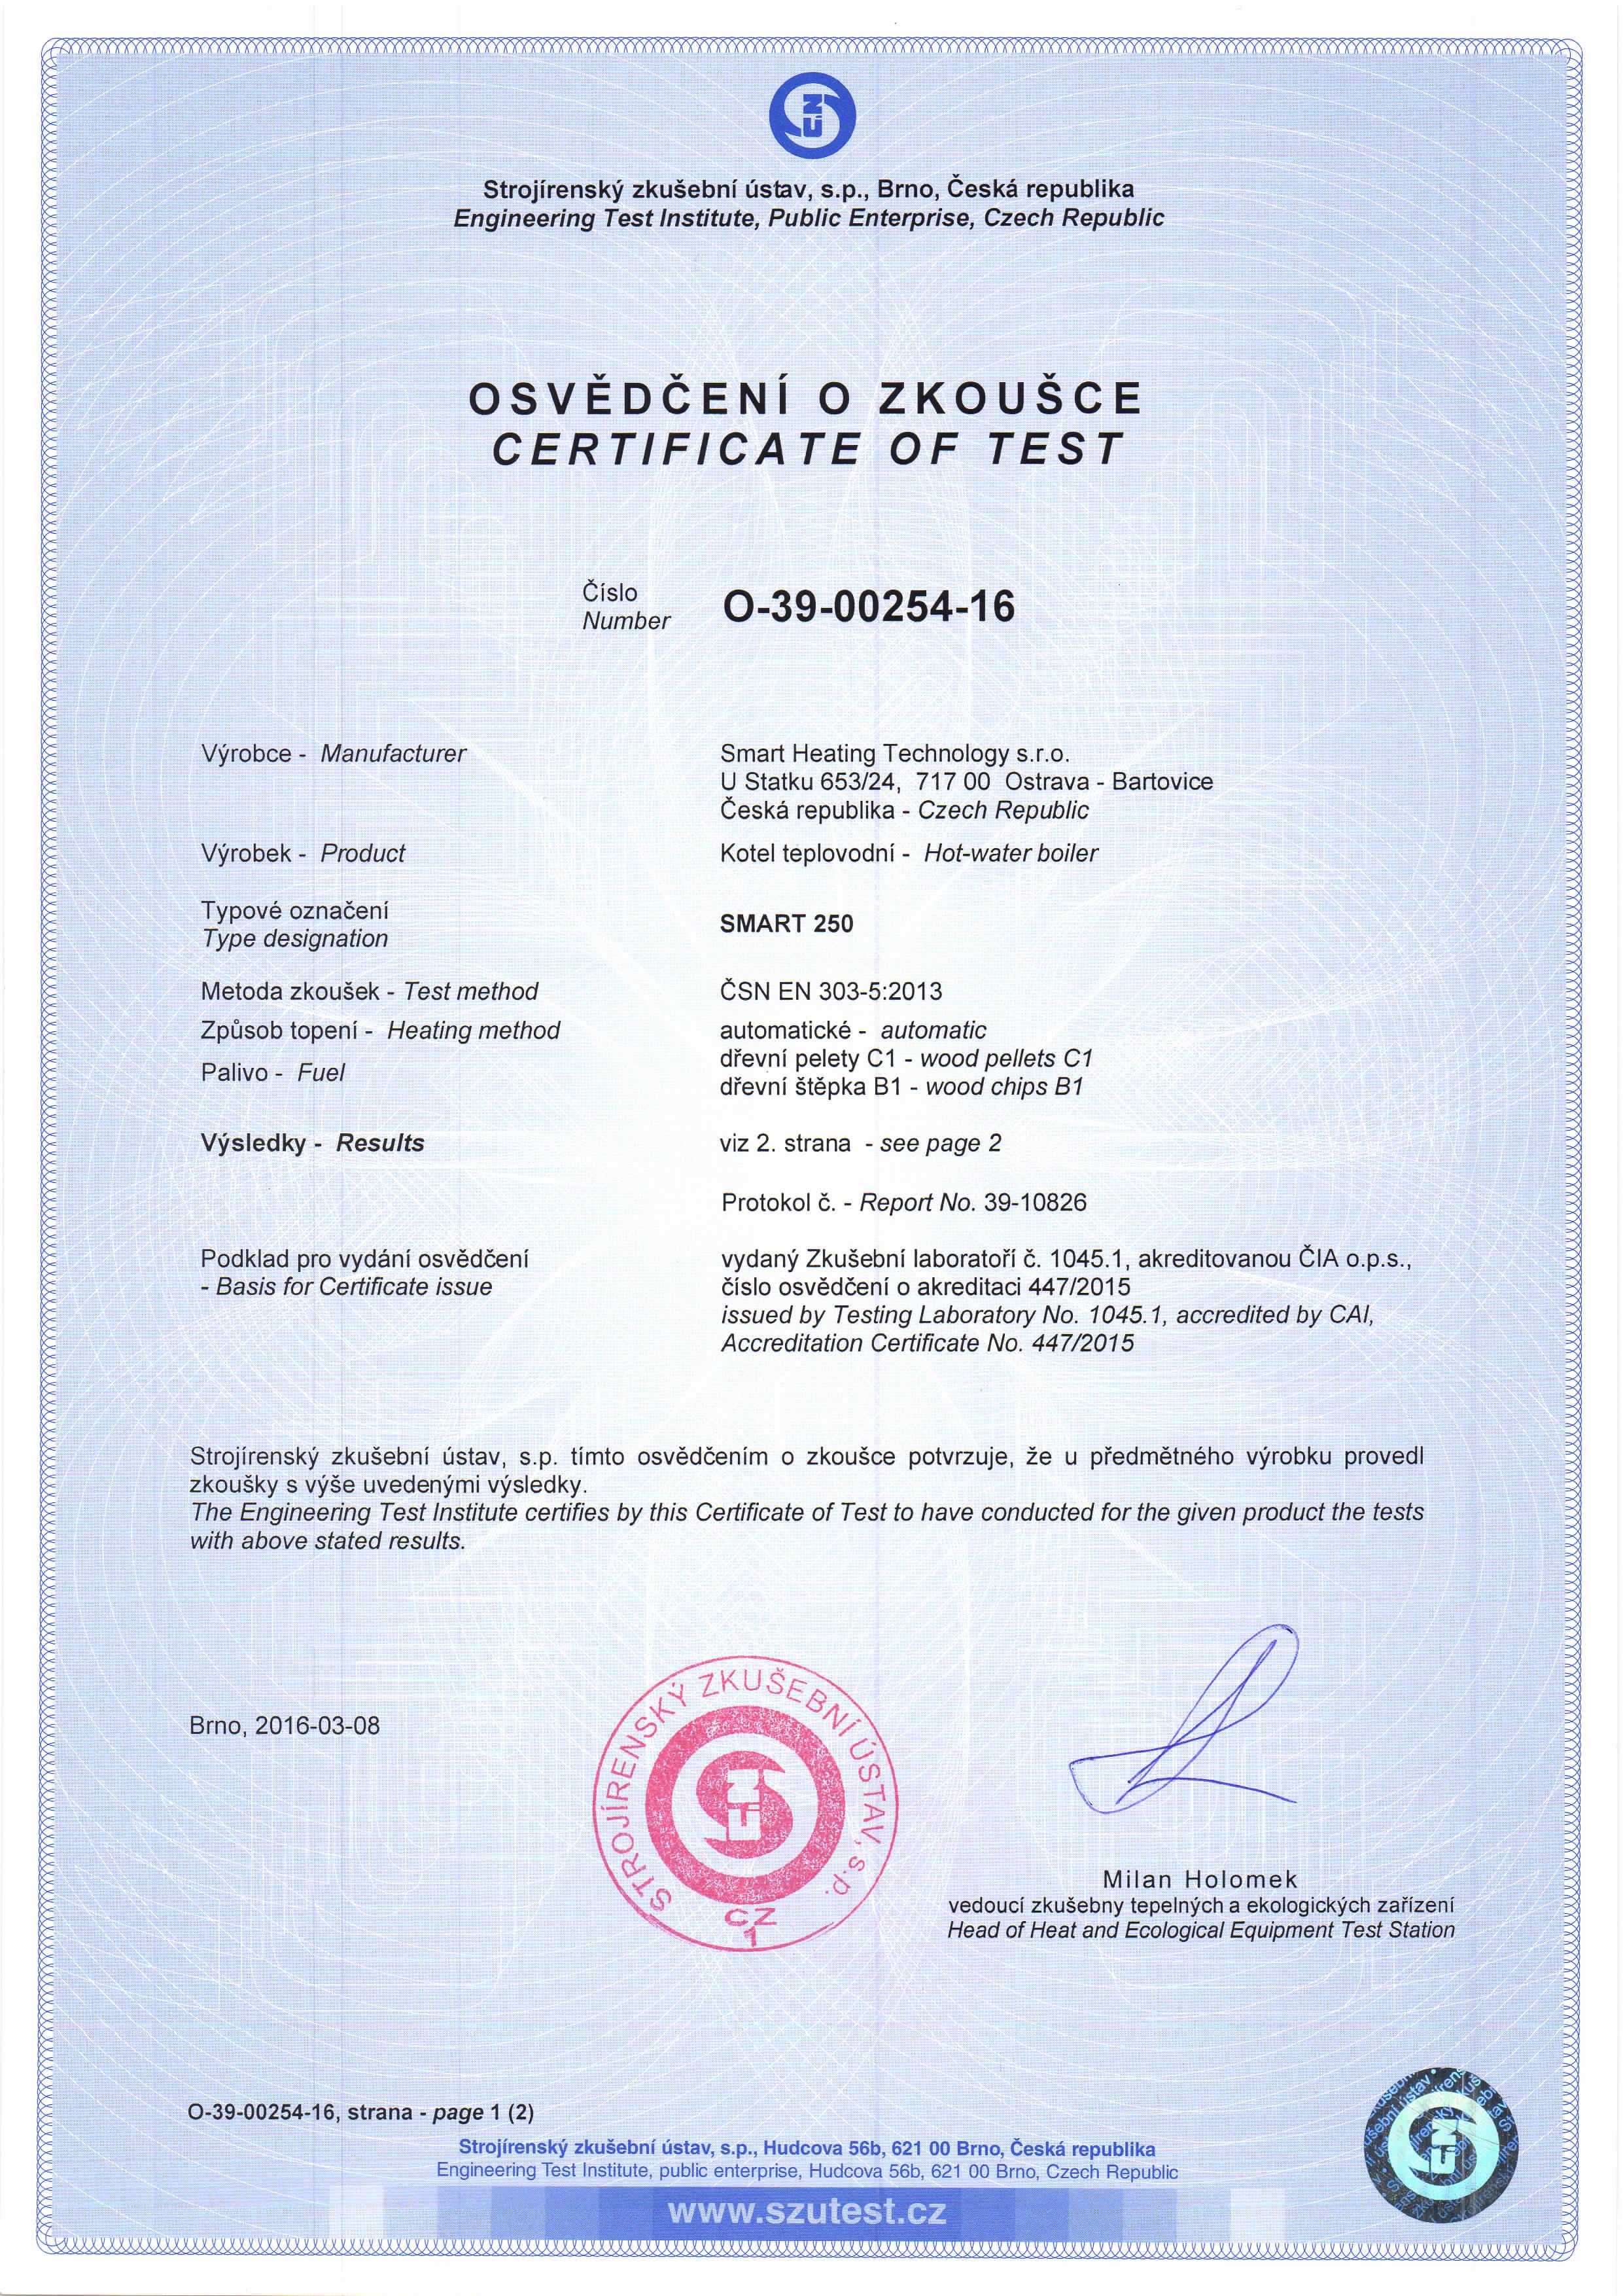 certificates-szu_250_500_stranka_1